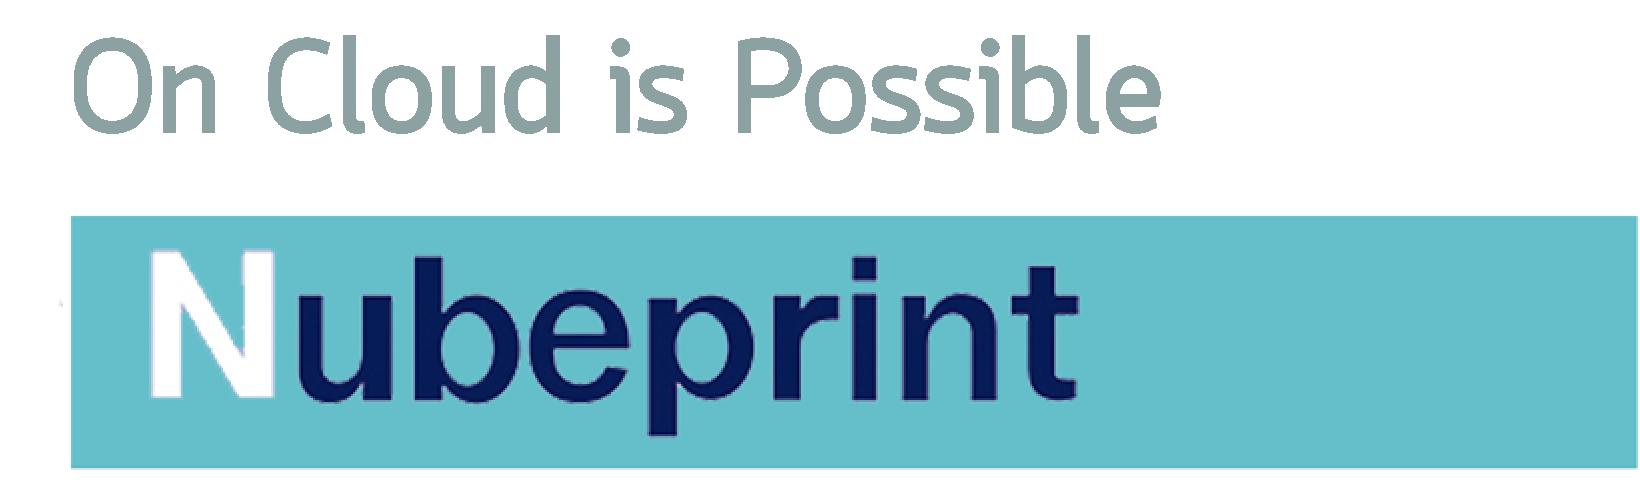 MPS (managed print service) คืออะไร